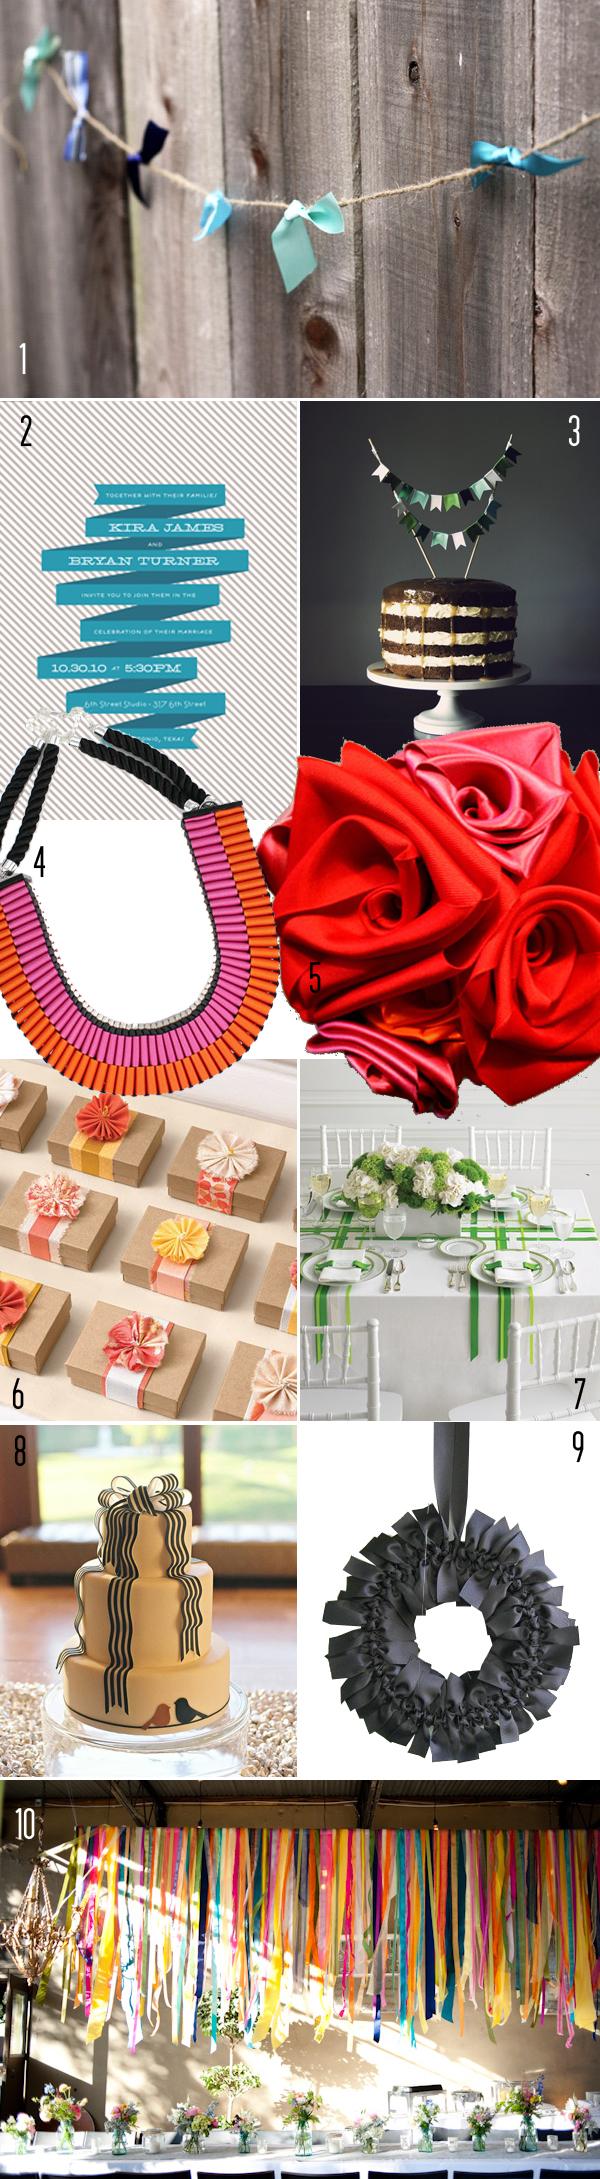 Top 10: Ribbon details 1